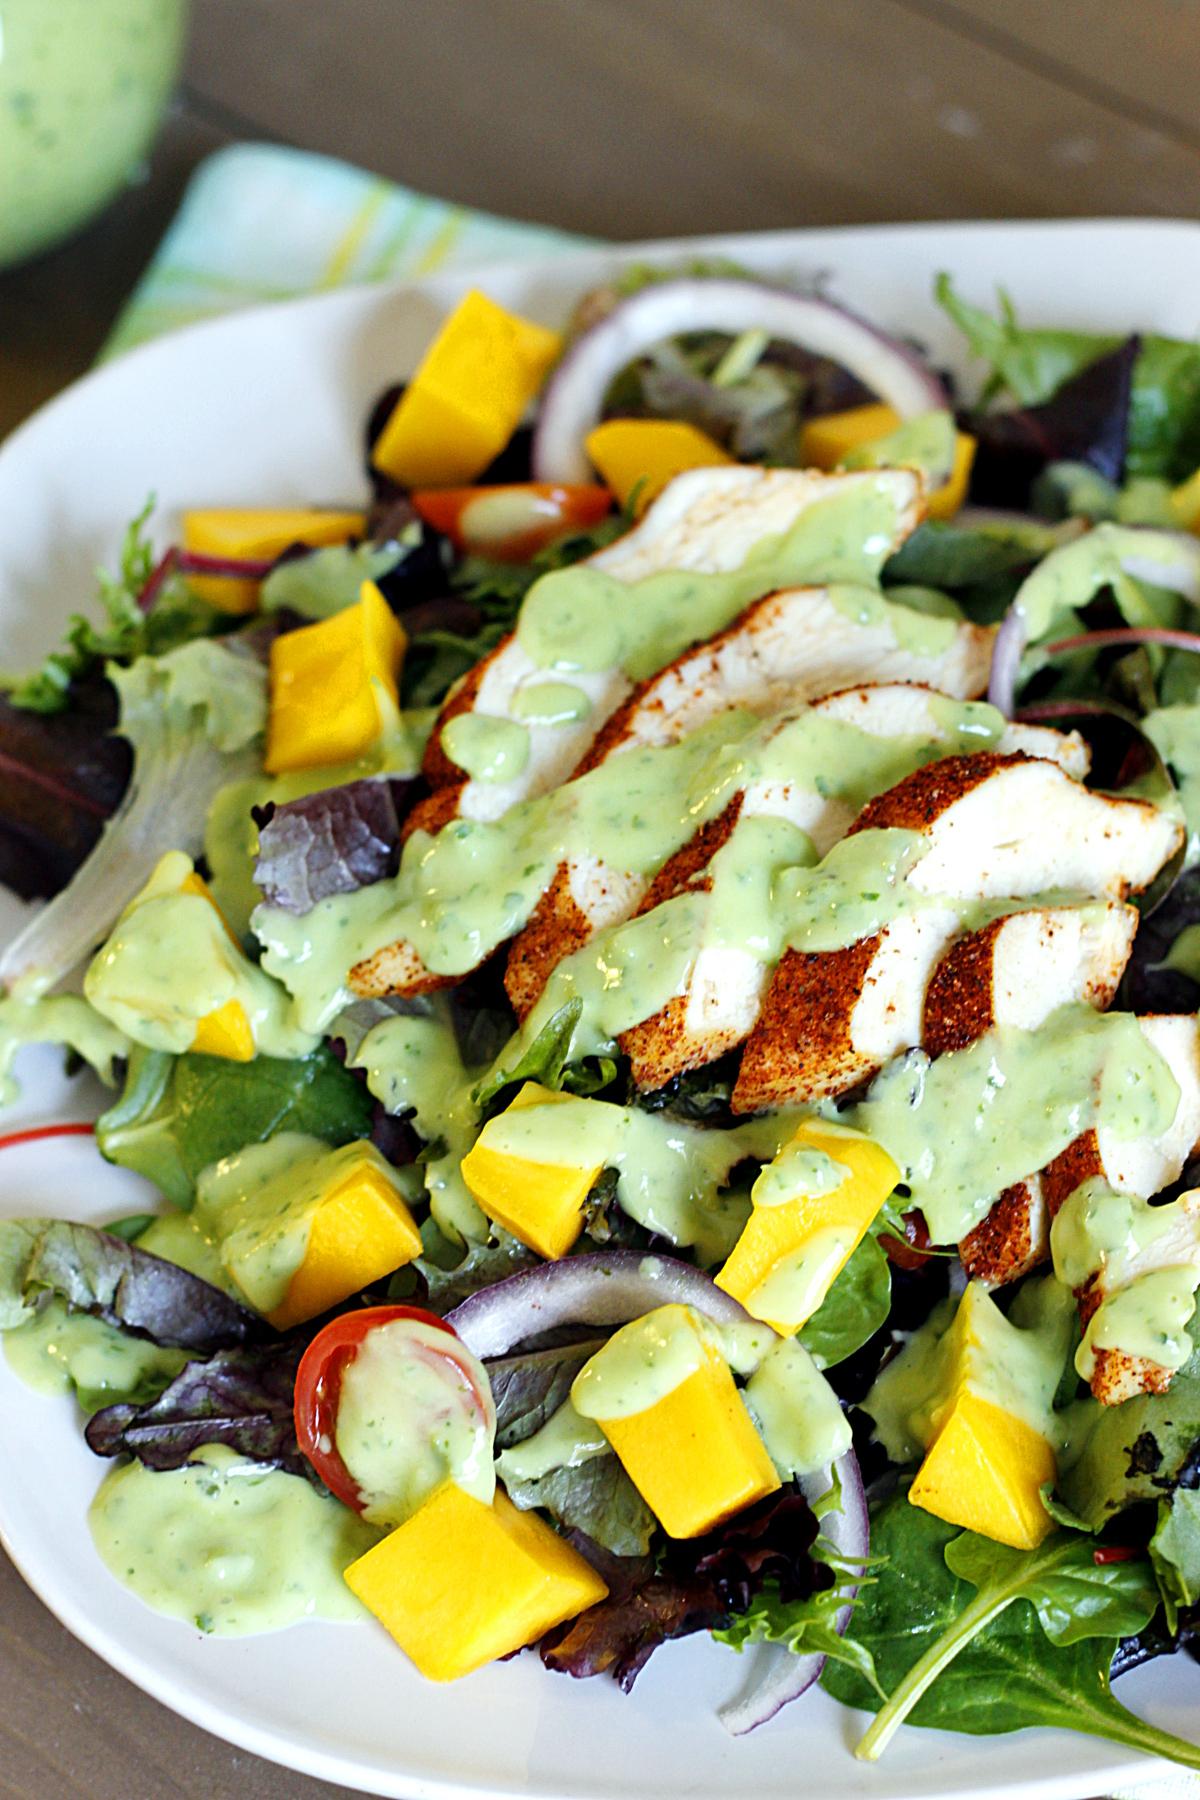 Blackened Chicken and Mango Salad with Creamy Avocado Dressing ...